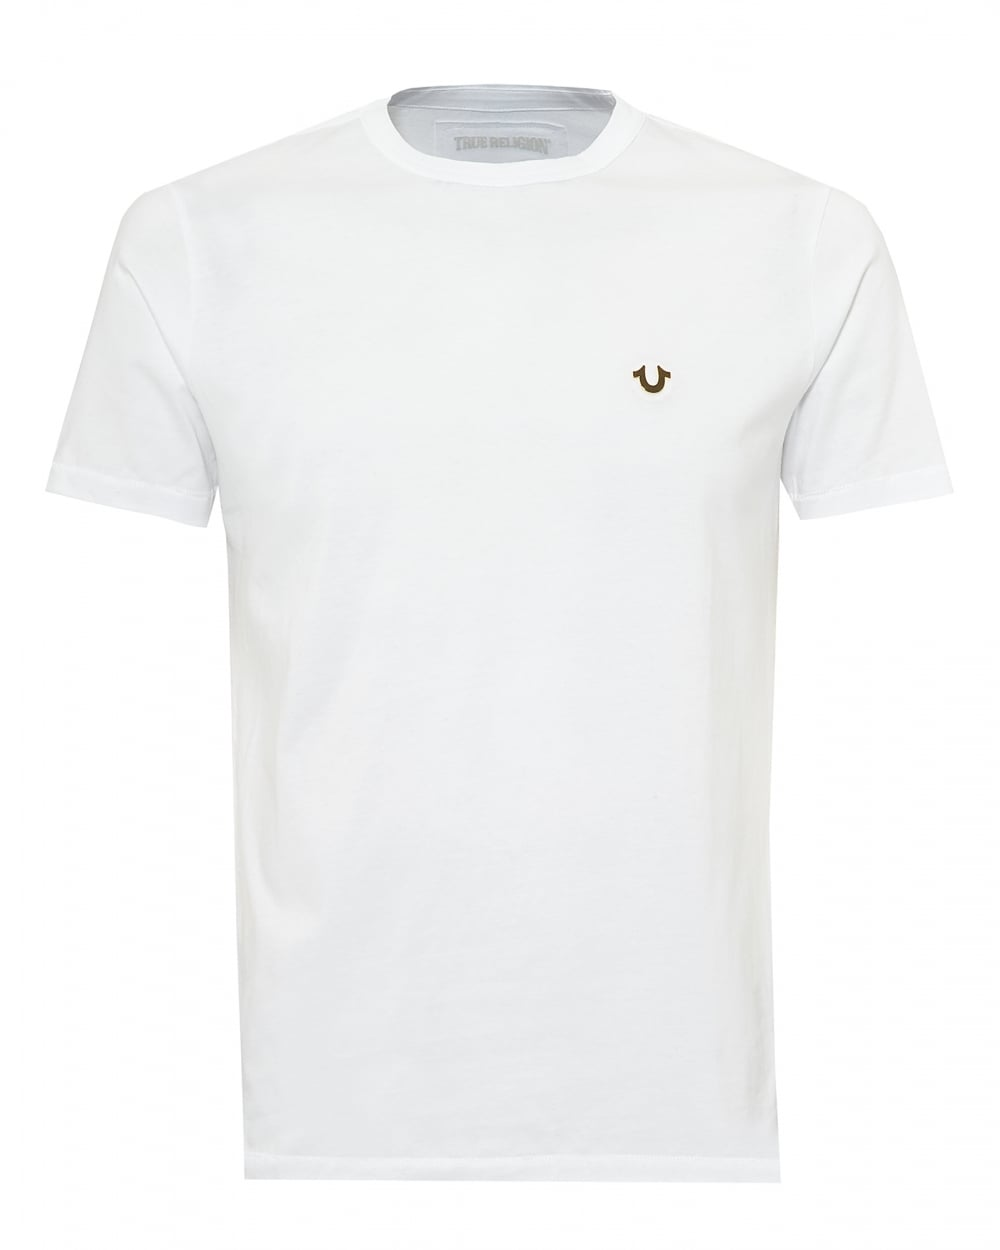 628d9f72a6ef Plain White Mens T Shirts